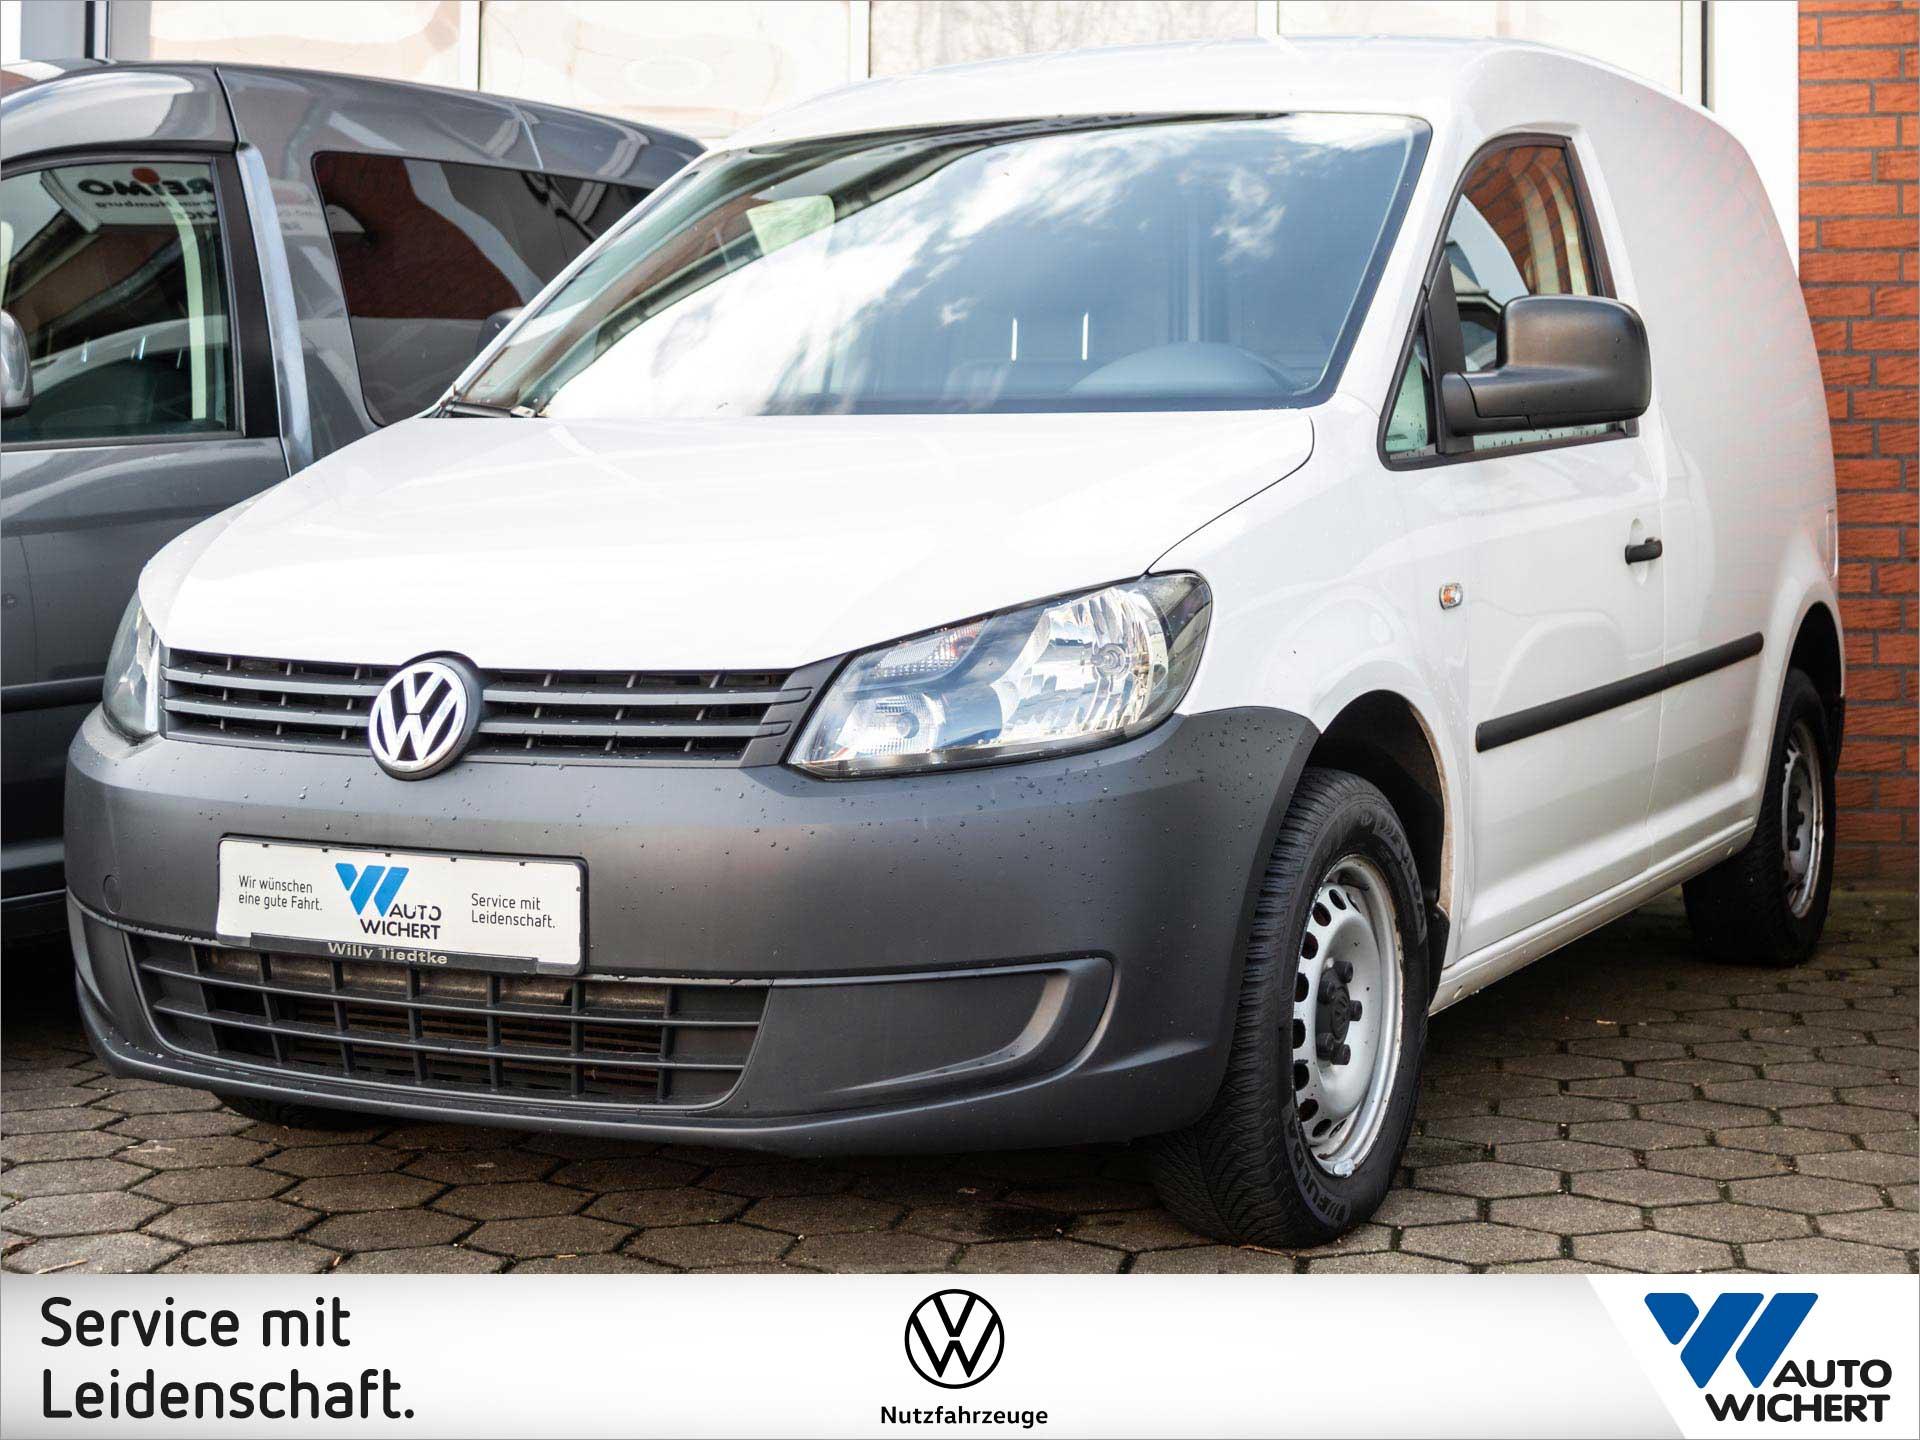 Volkswagen Caddy Kasten 1.6 TDI 5-Gang AHK/ HECKFLÜGELTÜREN, Jahr 2015, Diesel